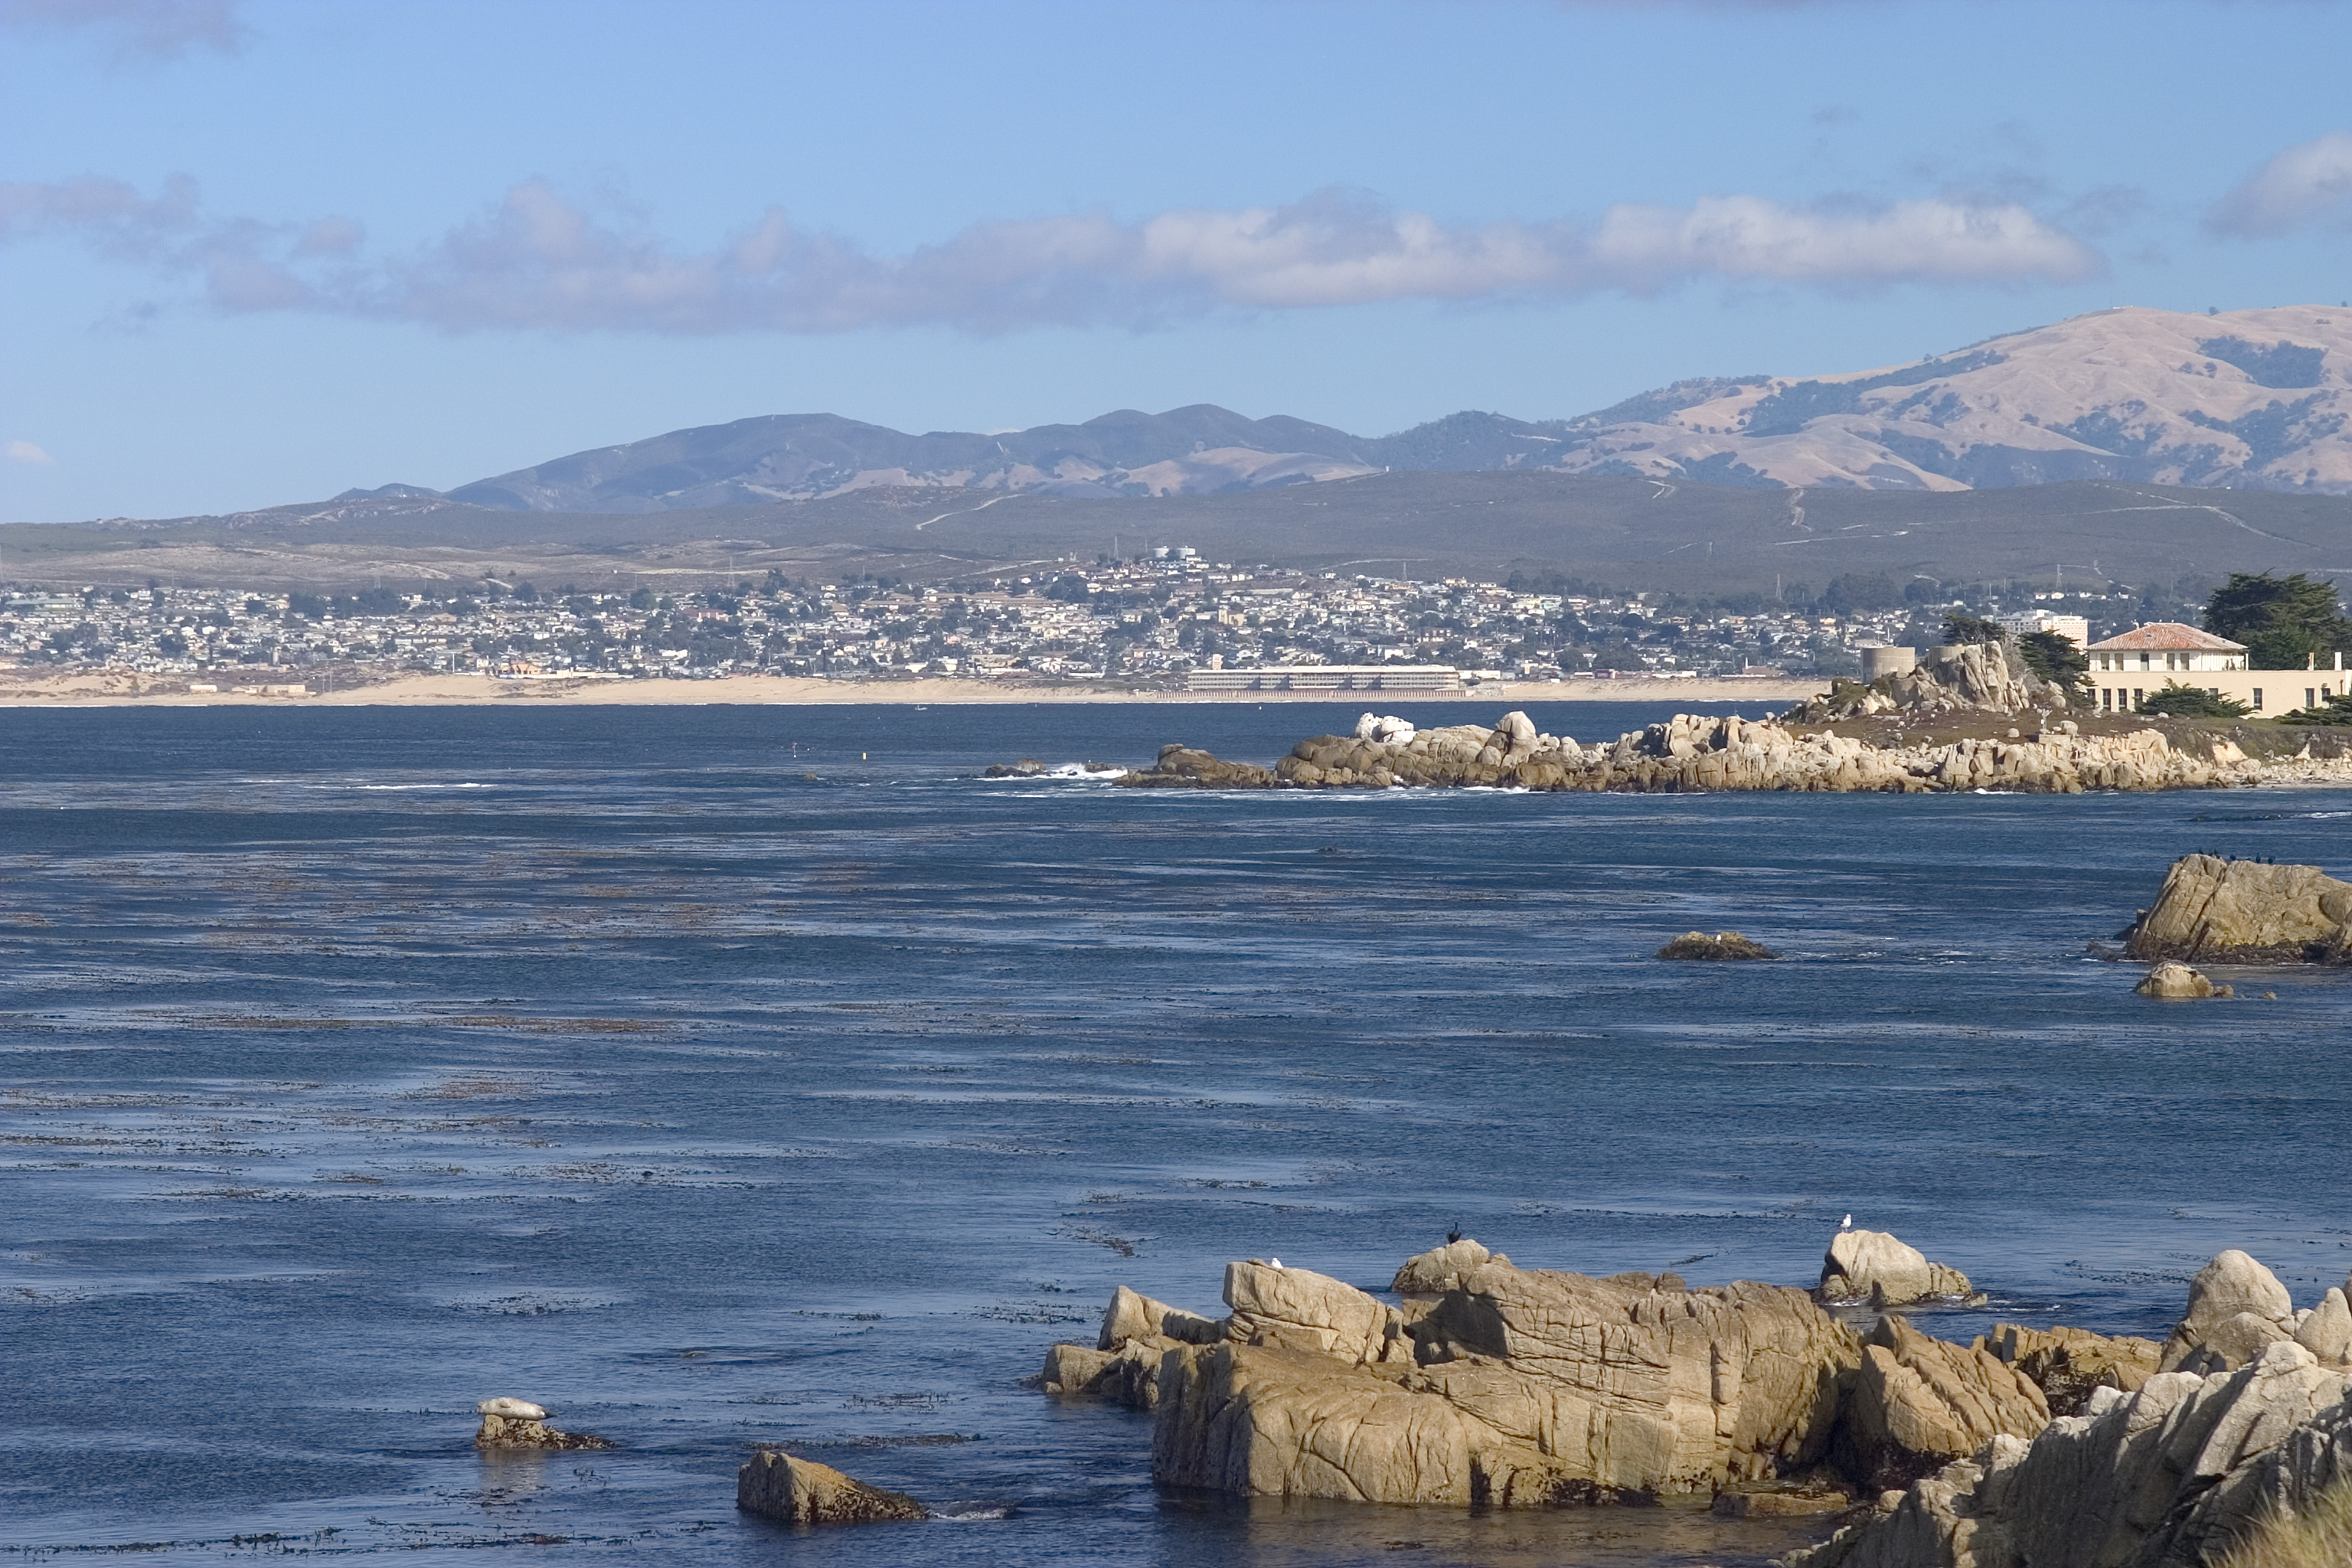 File:South Monterey Bay.jpg - Wikipedia